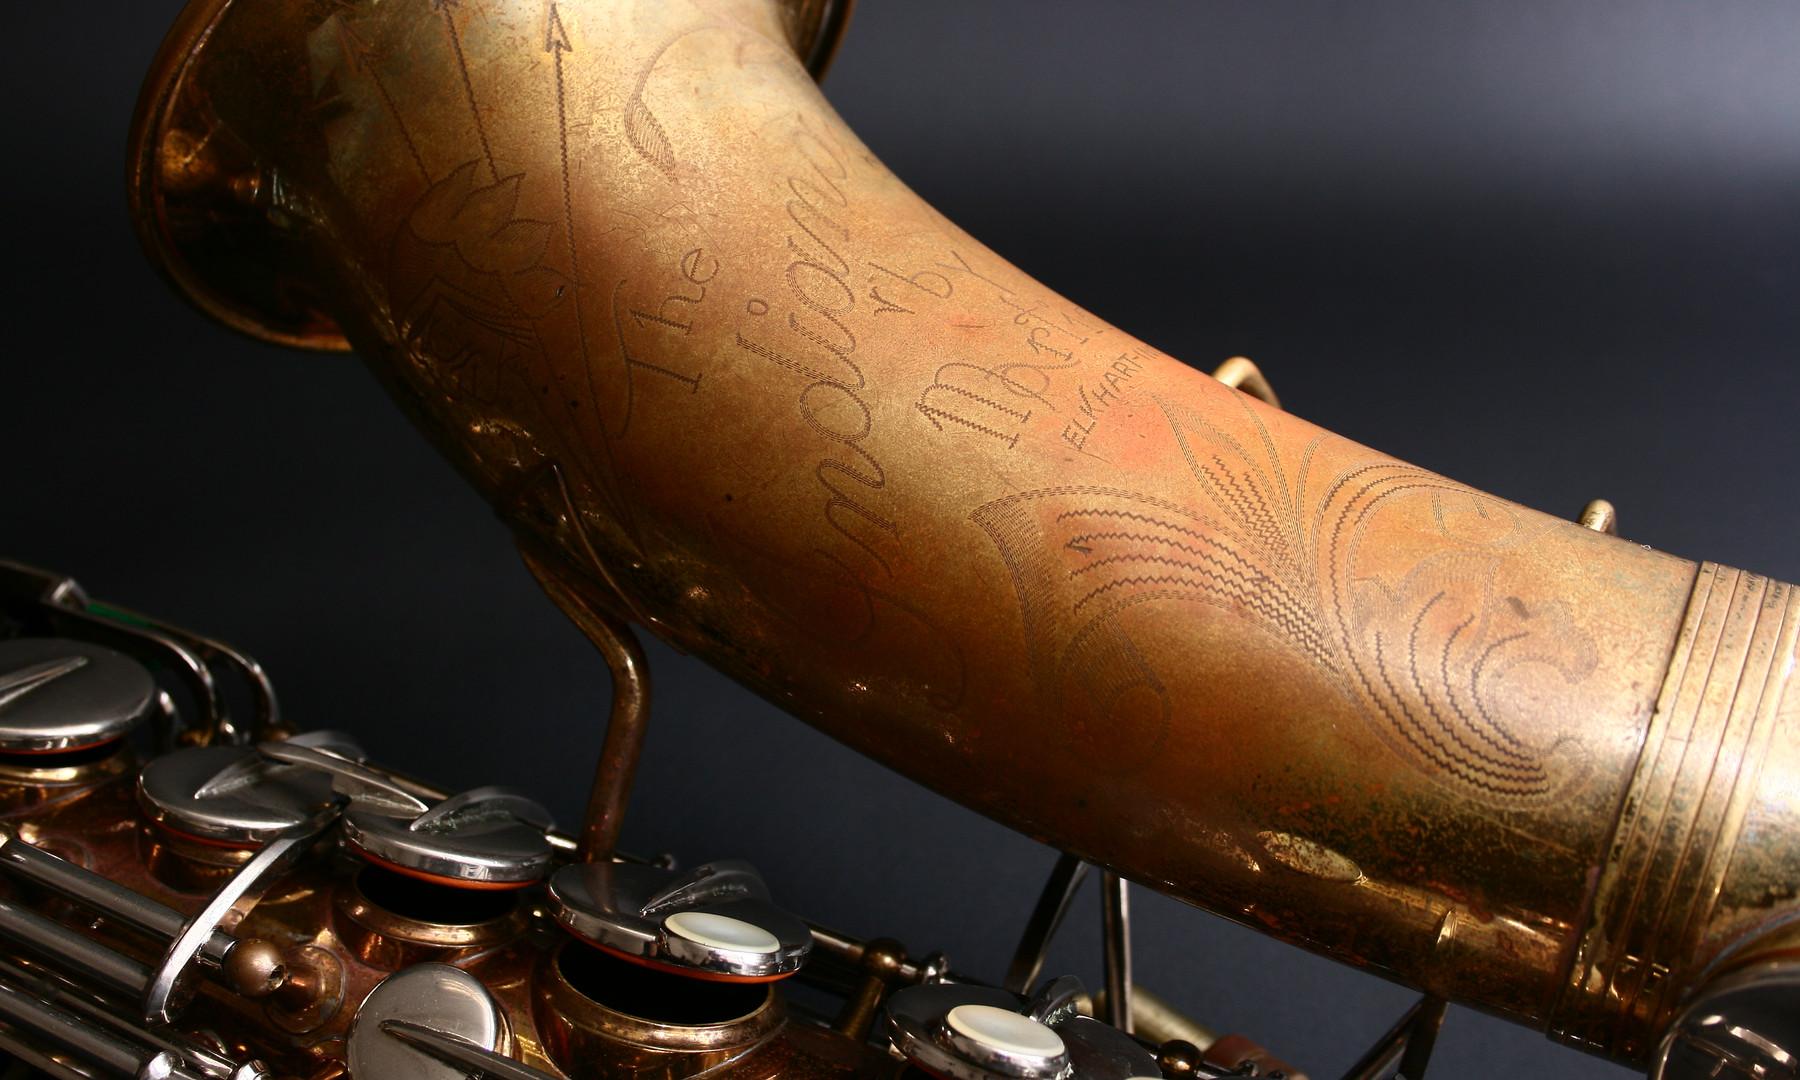 Altsaxophon Martin The Indiana